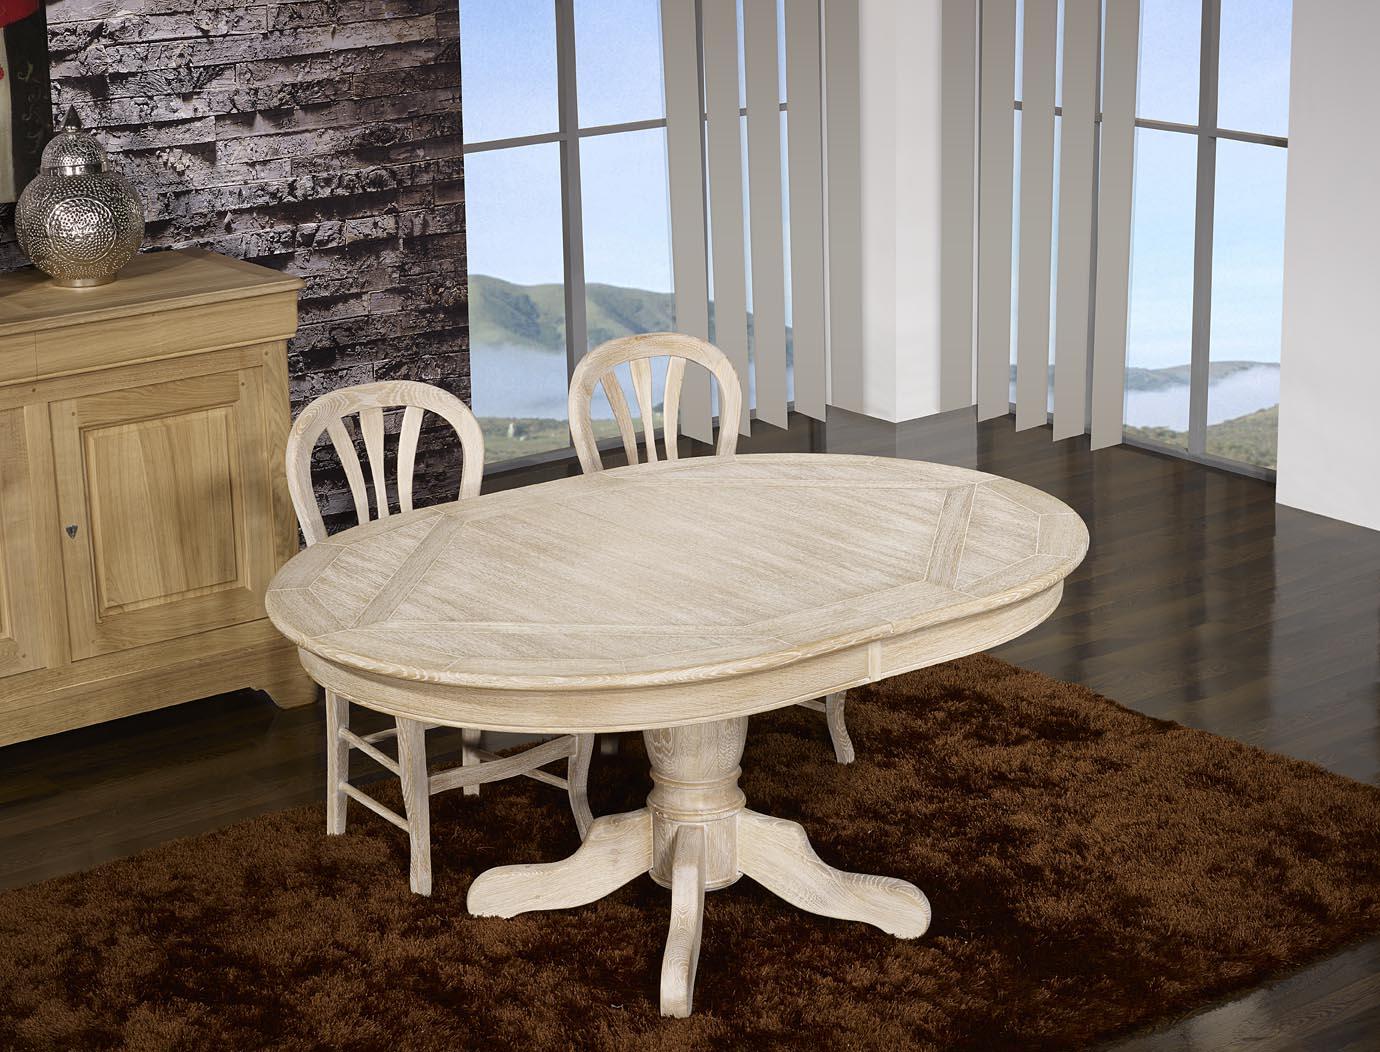 meuble en chne table ovale clment 160x120 pied central. Black Bedroom Furniture Sets. Home Design Ideas